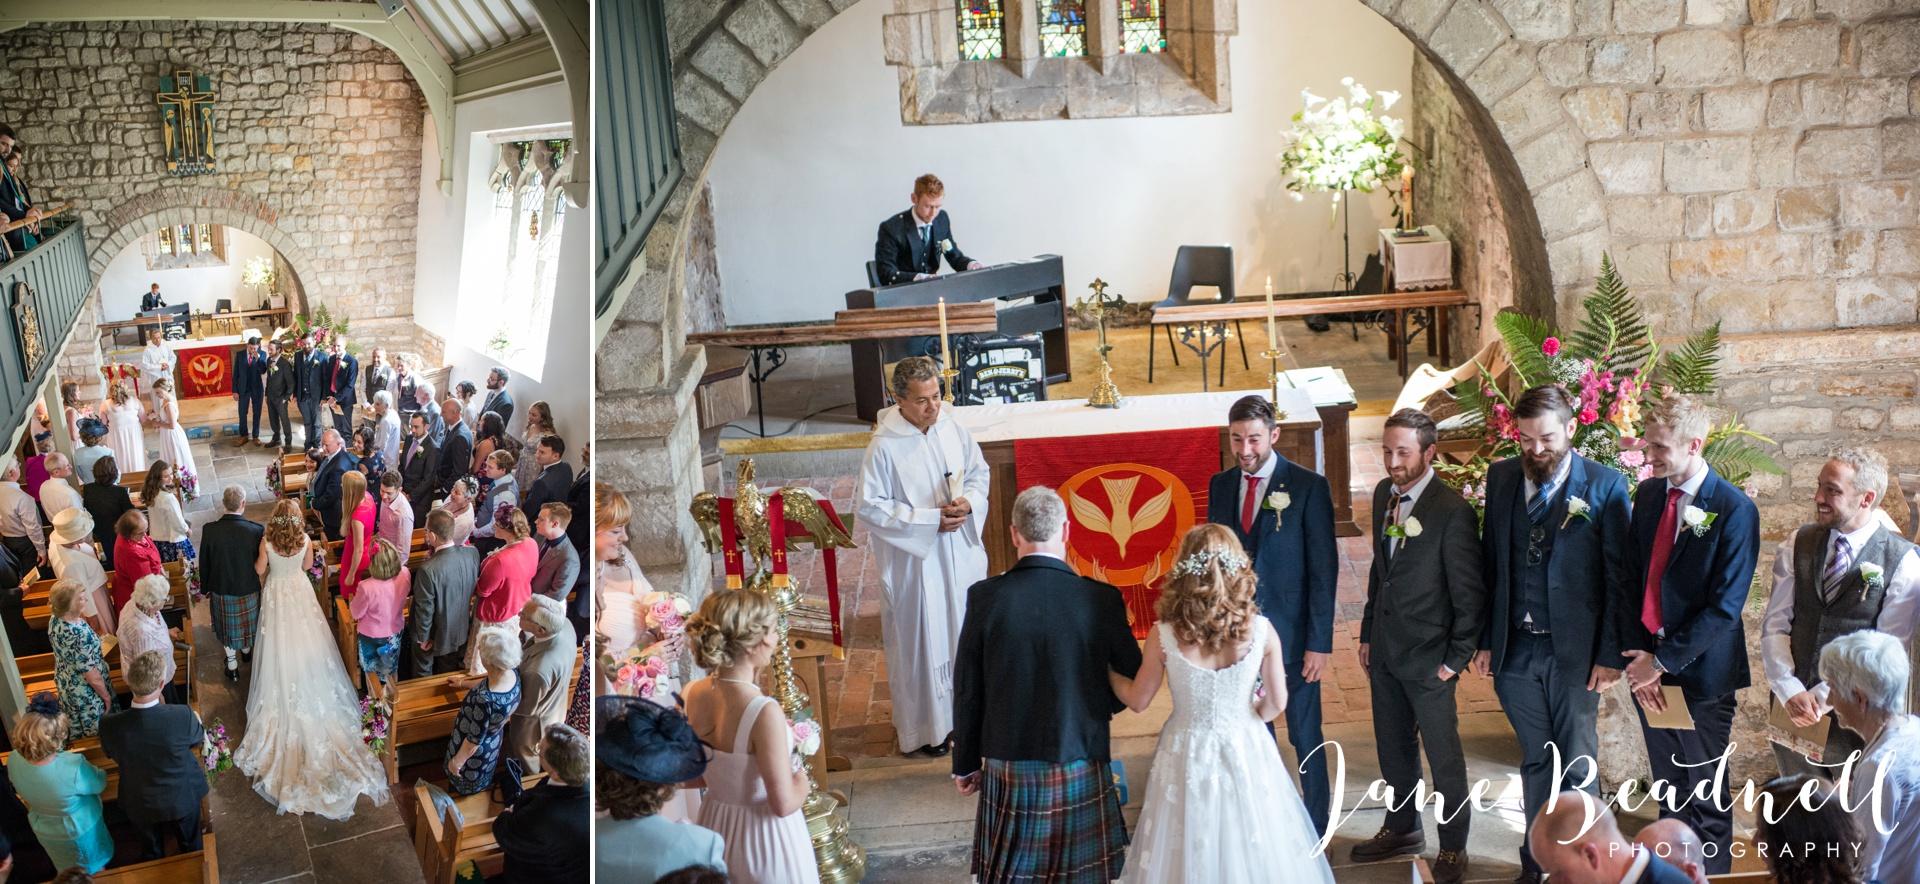 yorkshire-fine-art-wedding-photographer-jane-beadnell-photography-poppleton-york_0042